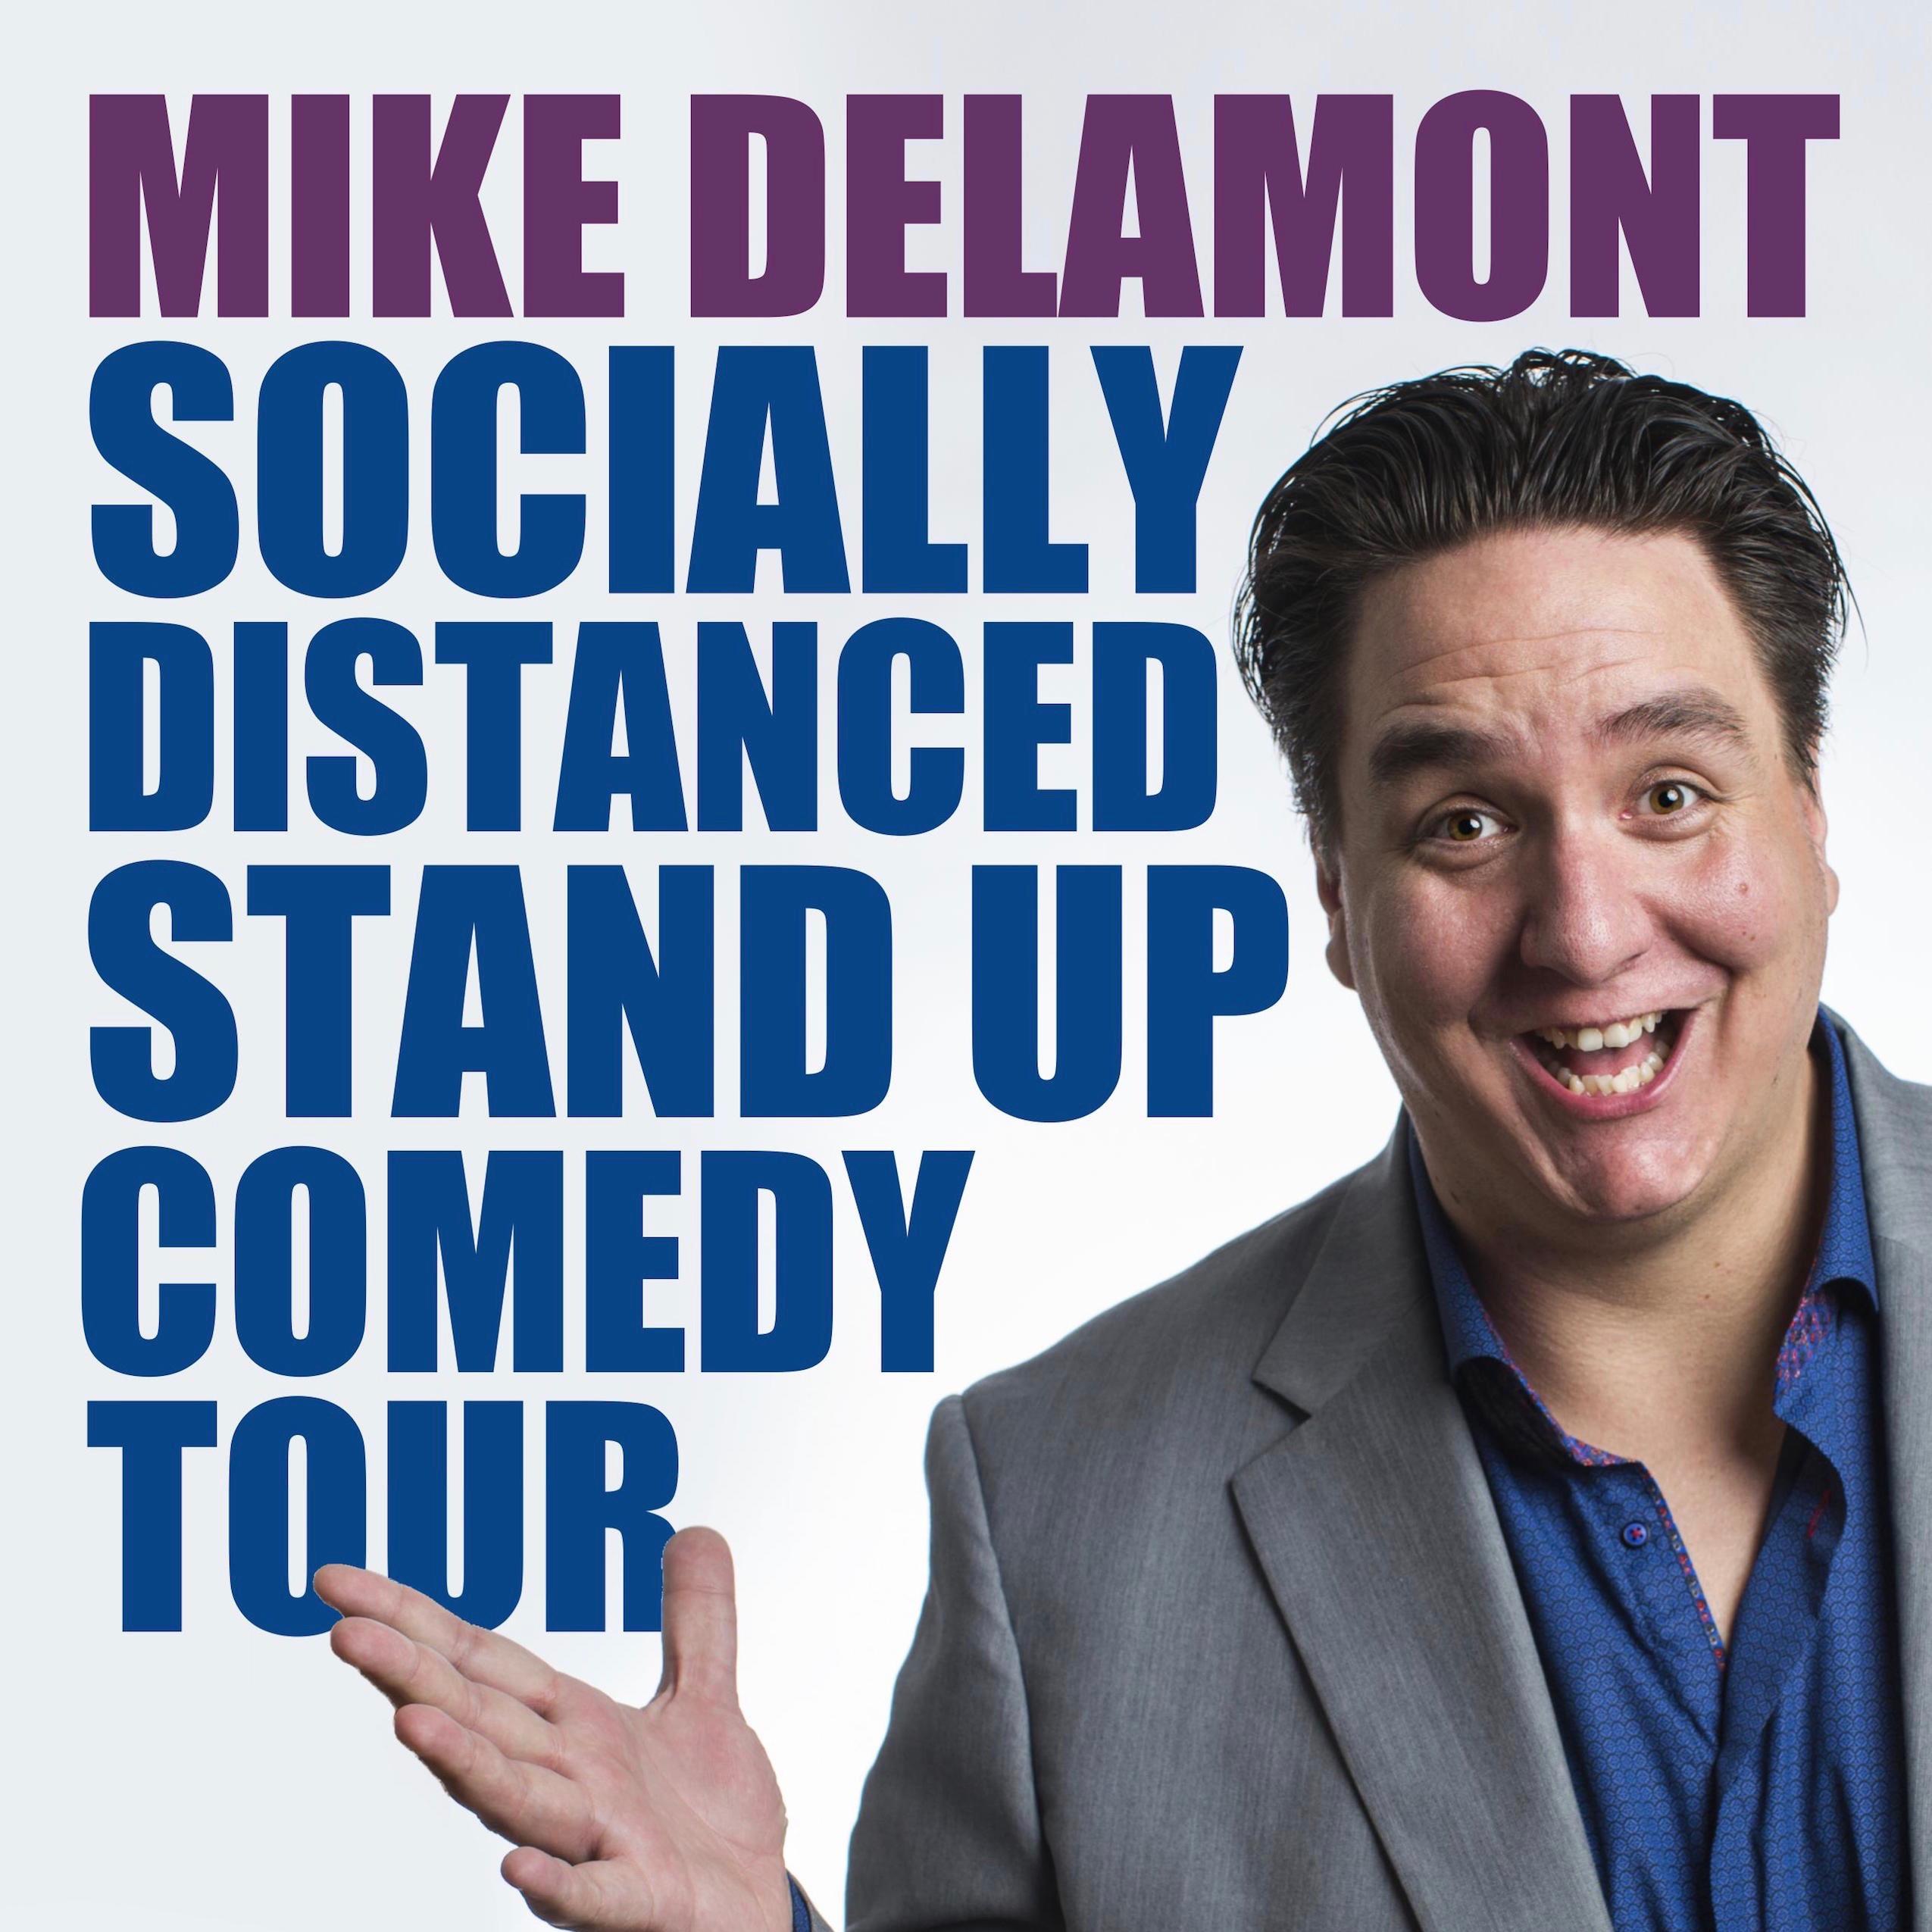 Mike Delamont